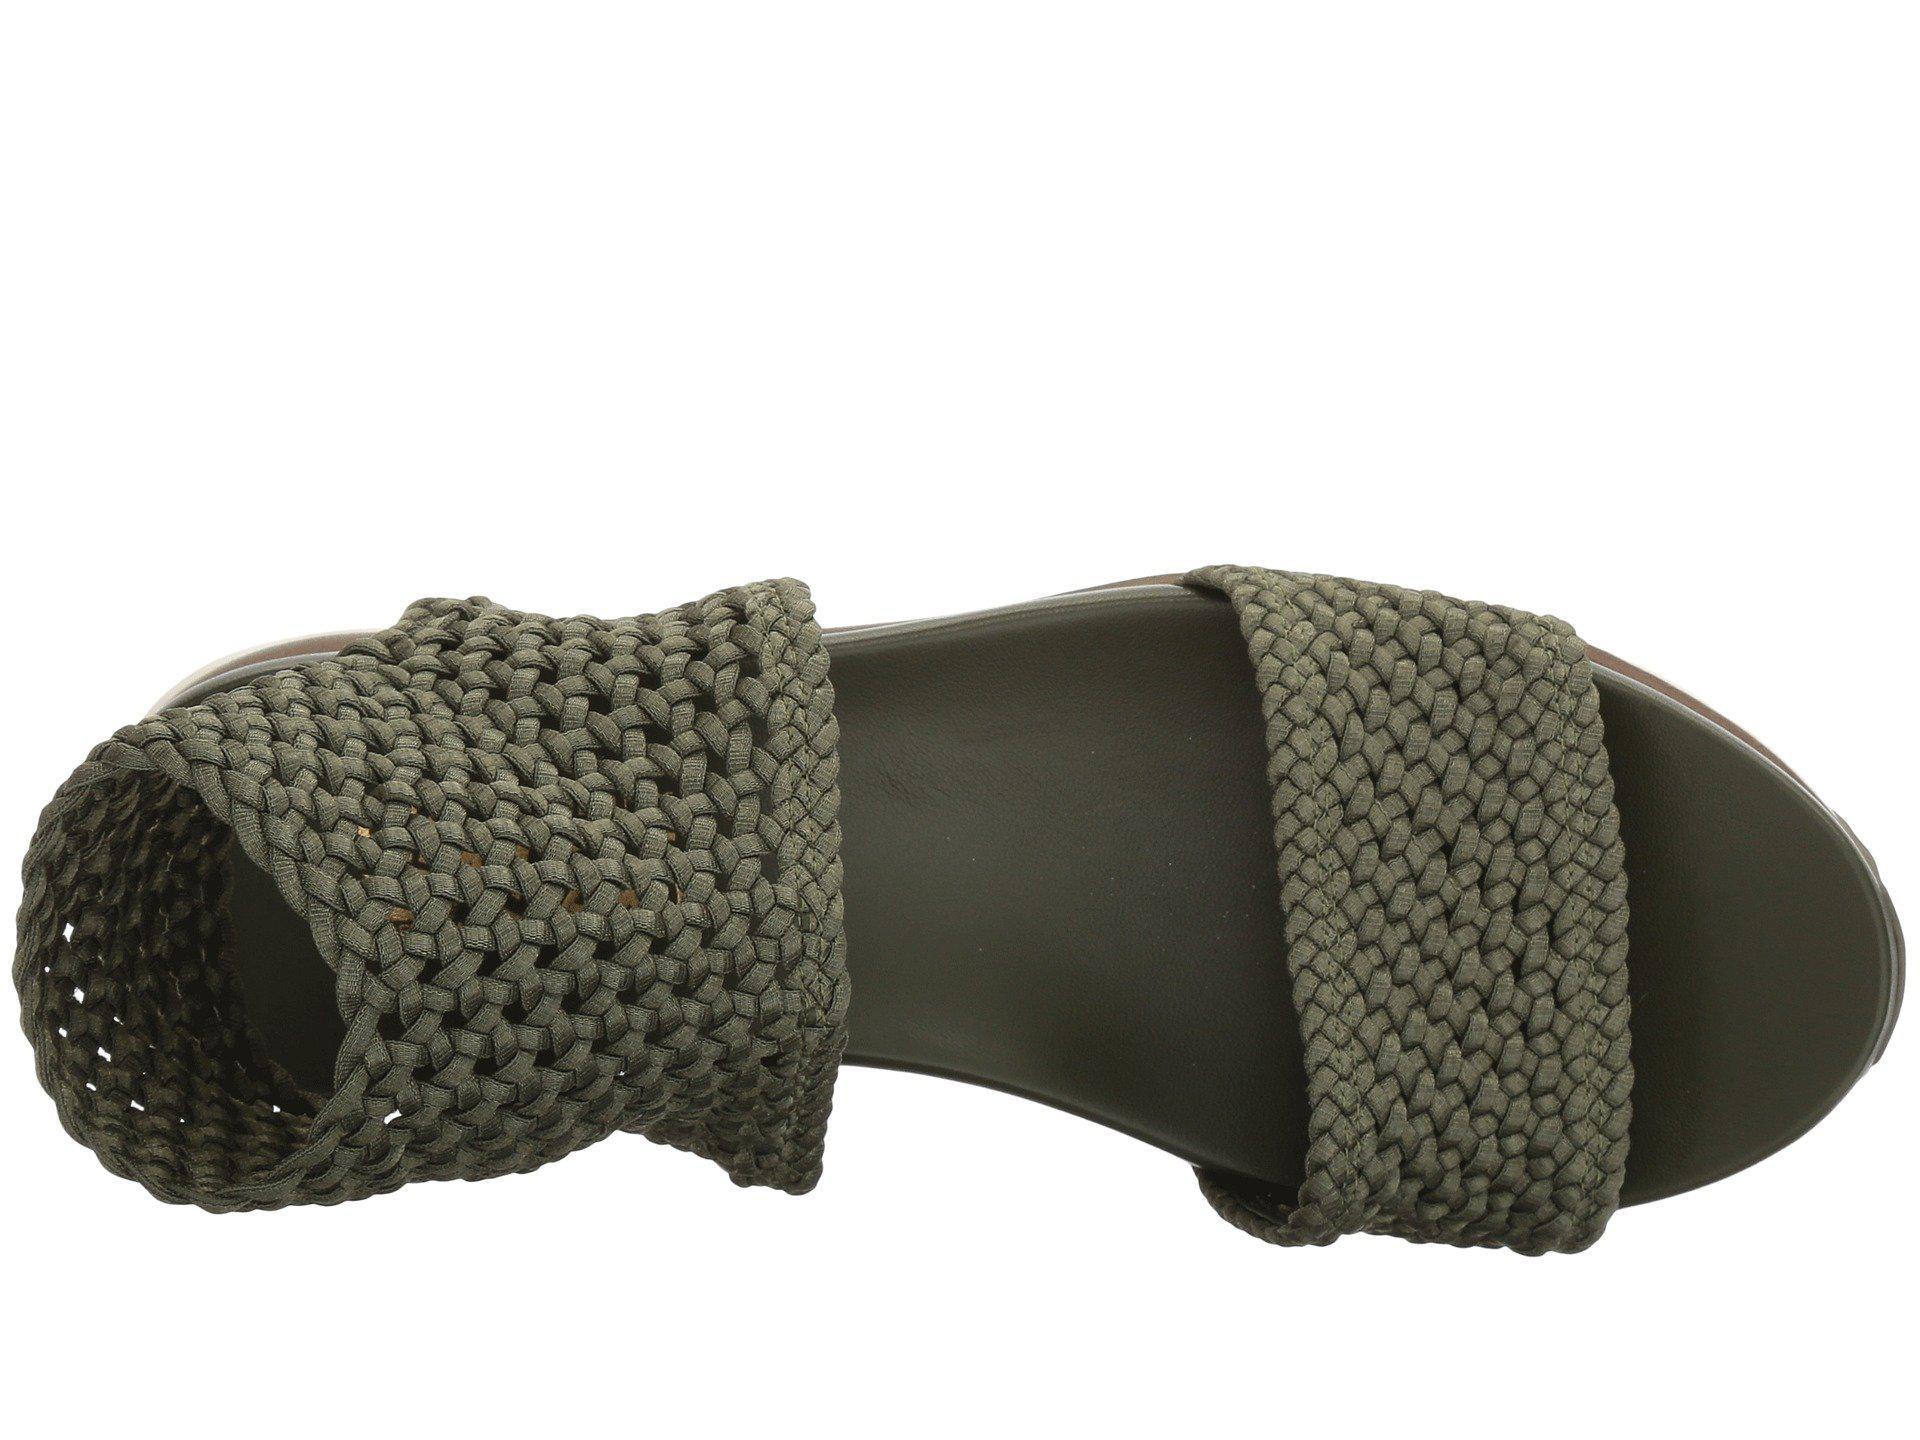 ac5589442067 Ferragamo - Green Elastic Platform Sandal - Lyst. View fullscreen